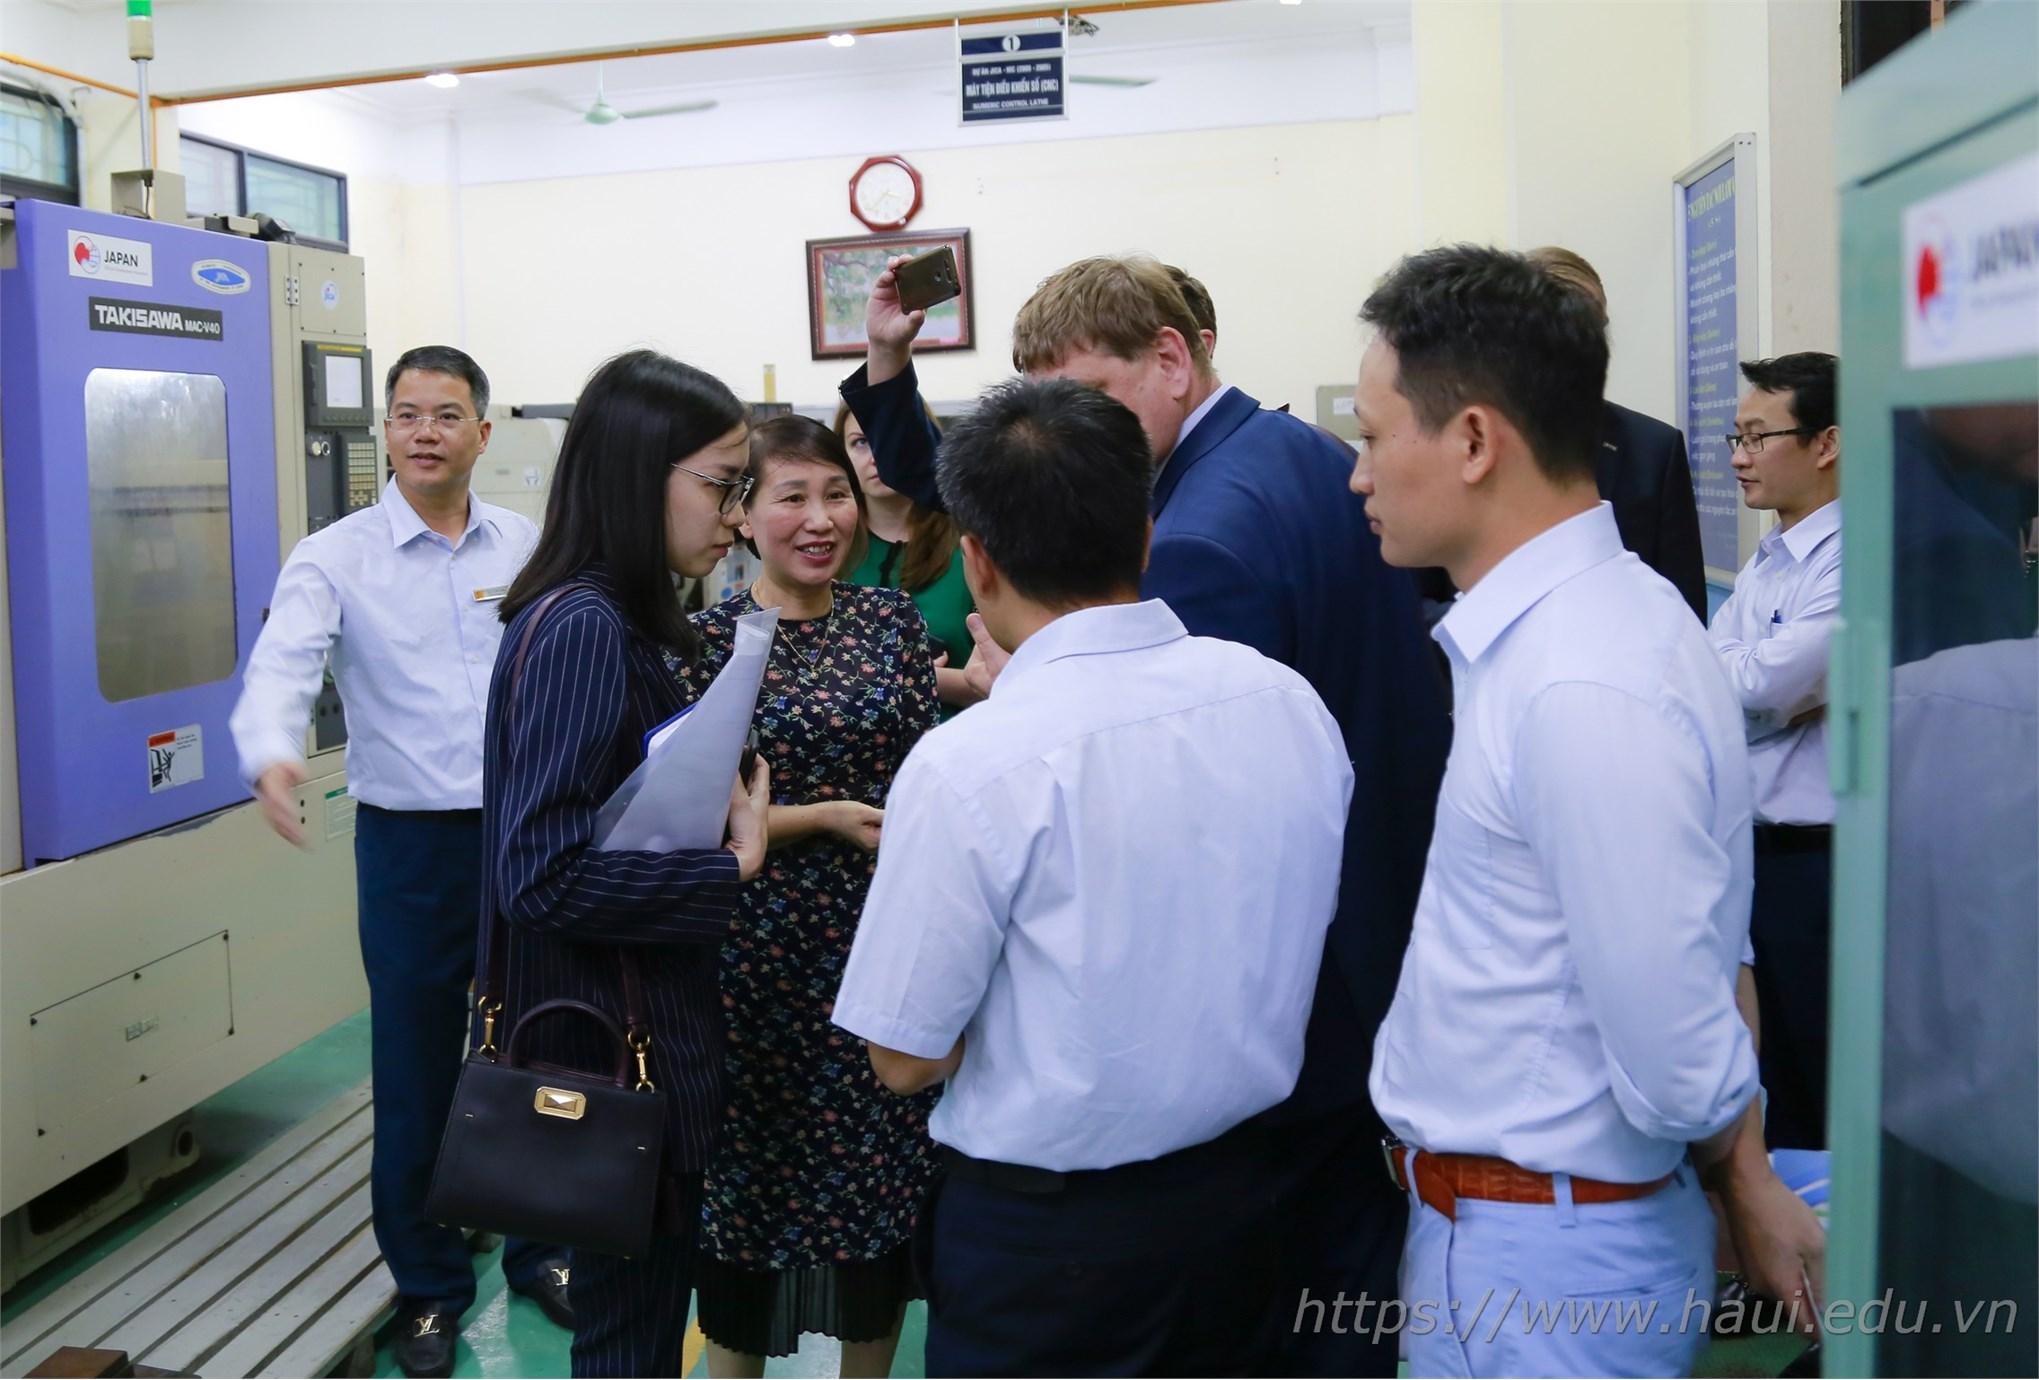 Hanoi University of Industry seeks cooperation opportunities with Russian Universities